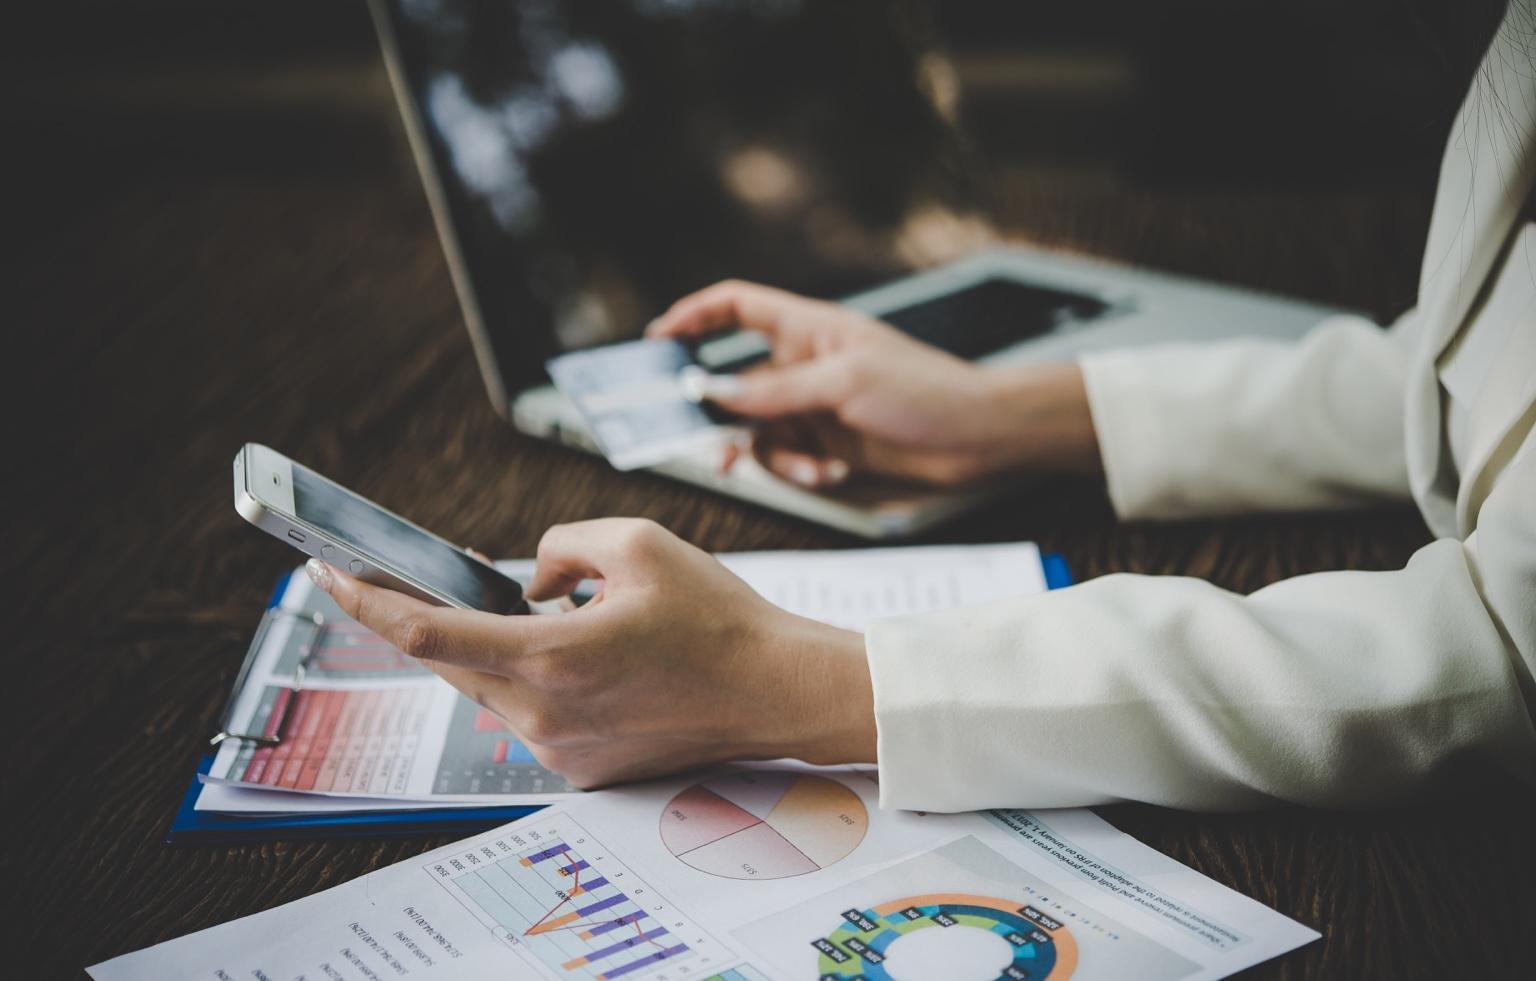 ВТБ на 70% увеличил объем кредитования МСП по «Программе 1764» - новости Афанасий